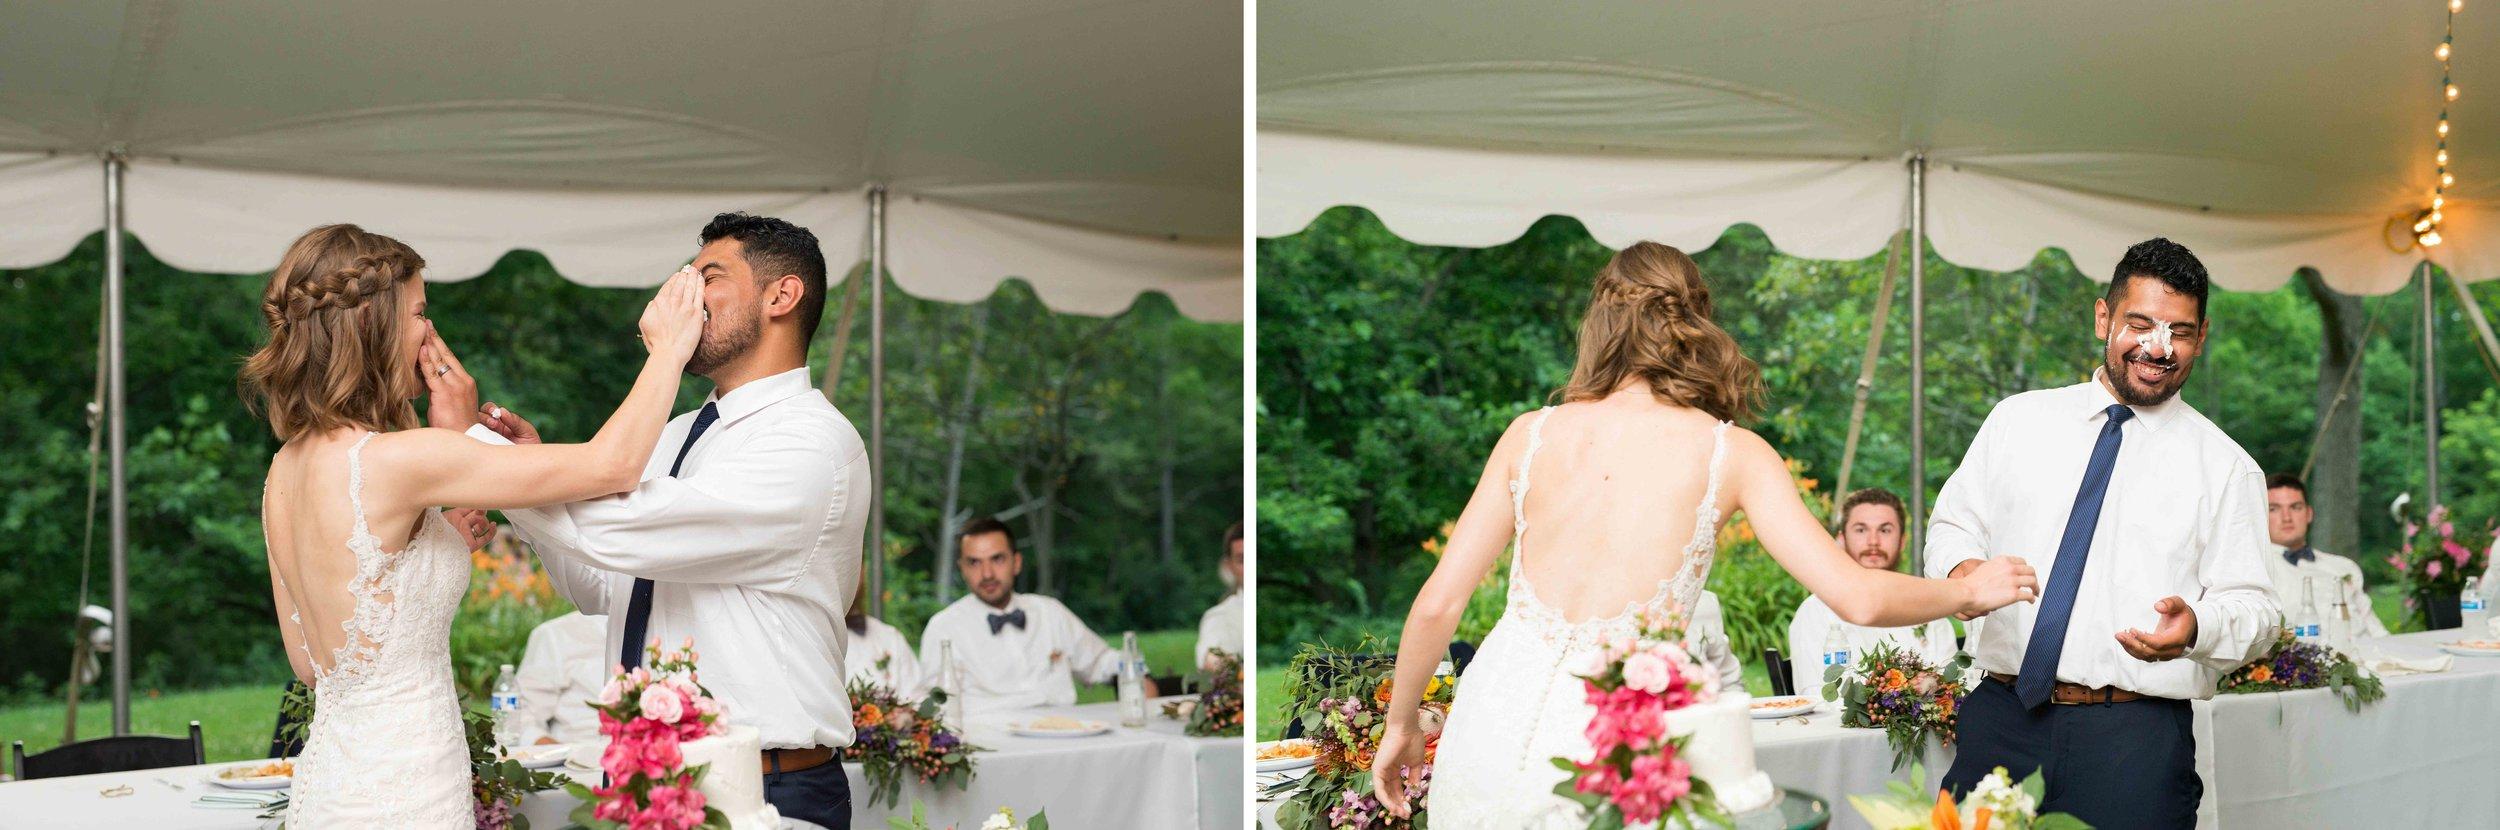 ff cincinnati wedding photographer reception0004.jpg